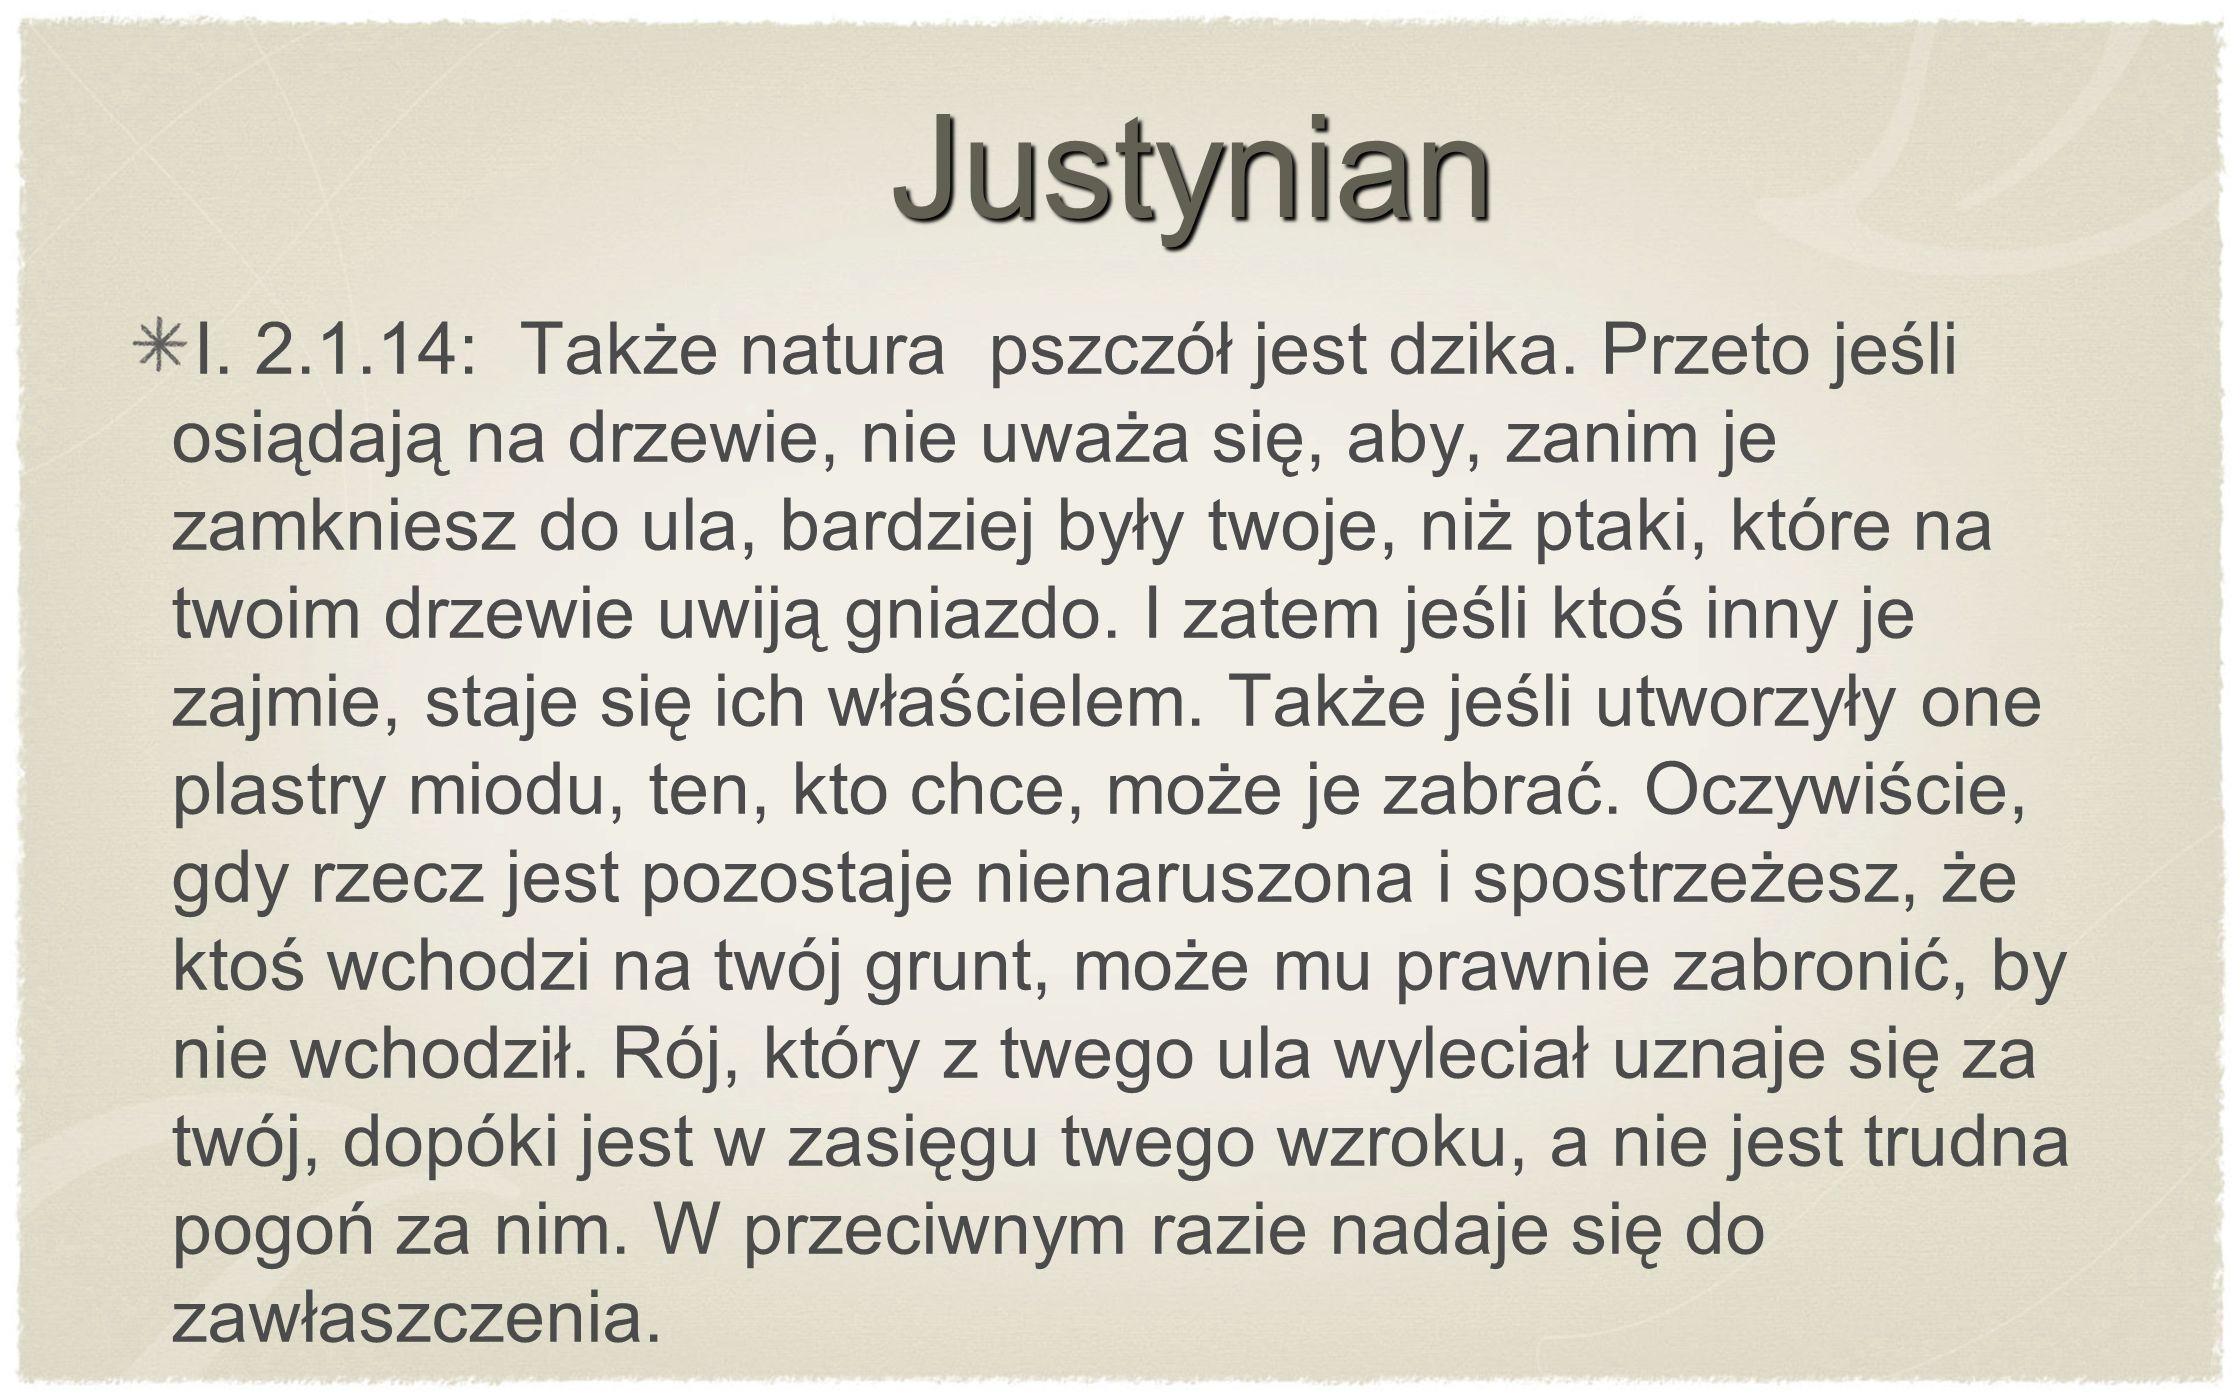 Justynian